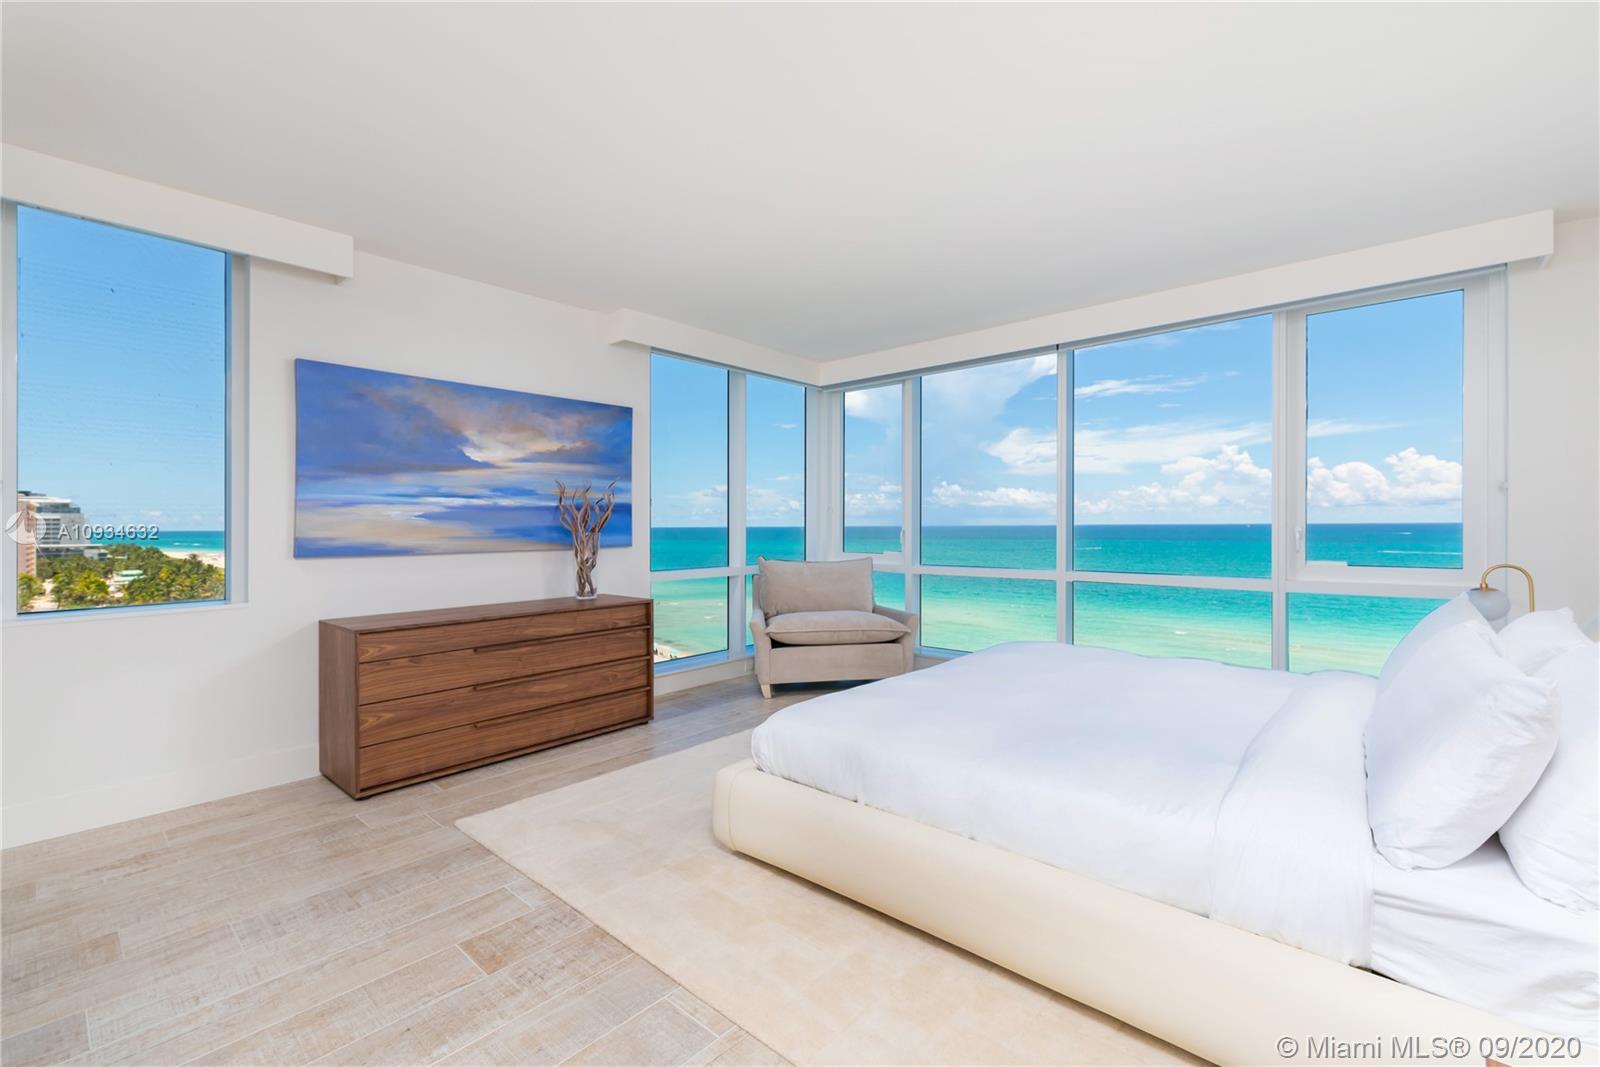 1 Hotel & Homes #1019 - 102 24 ST #1019, Miami Beach, FL 33139